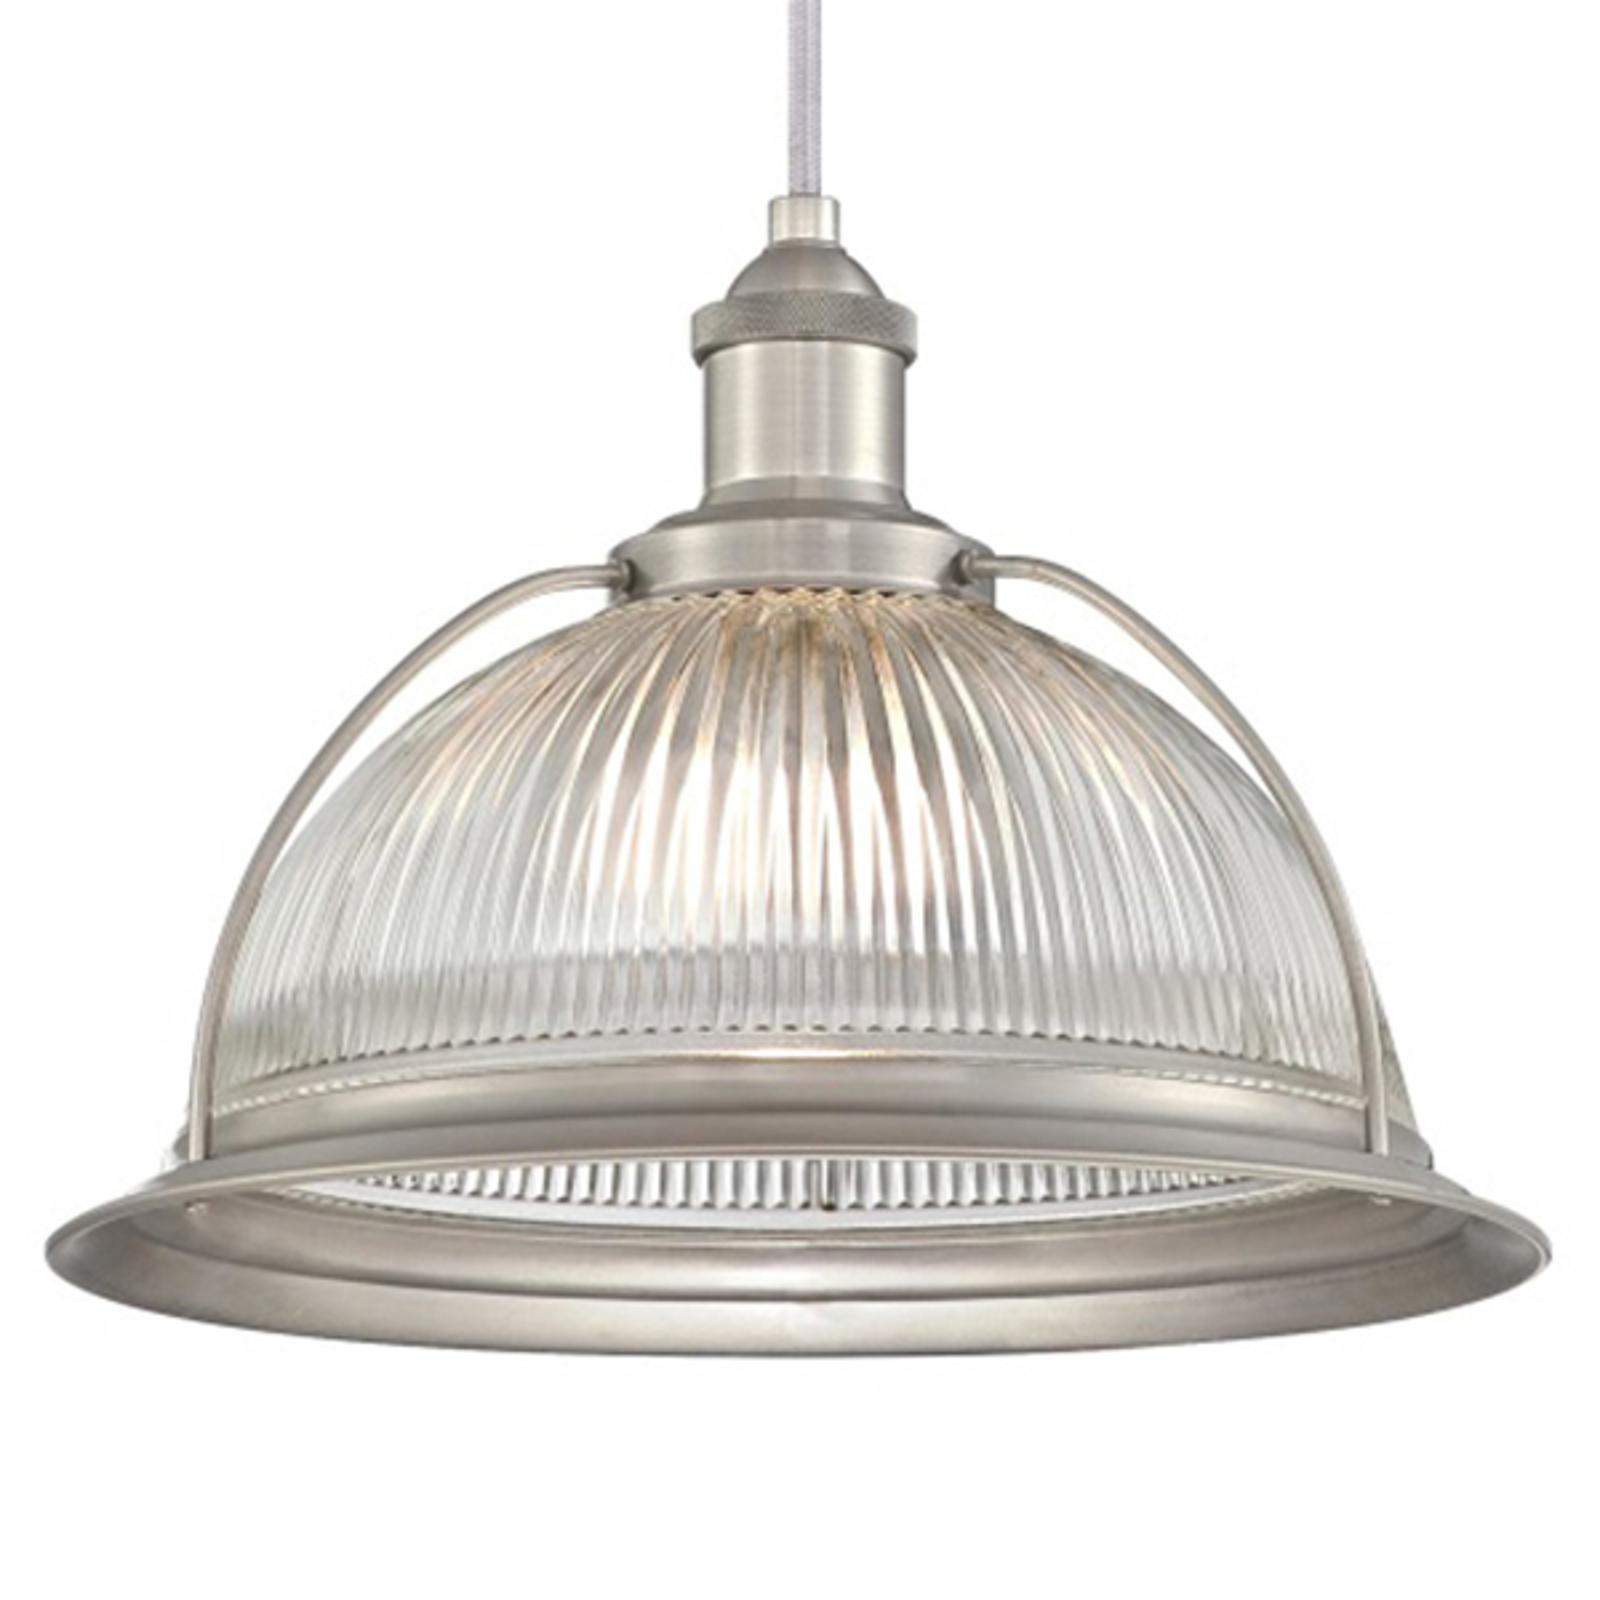 Westinghouse 6338740 hanglamp, glas, nikkel